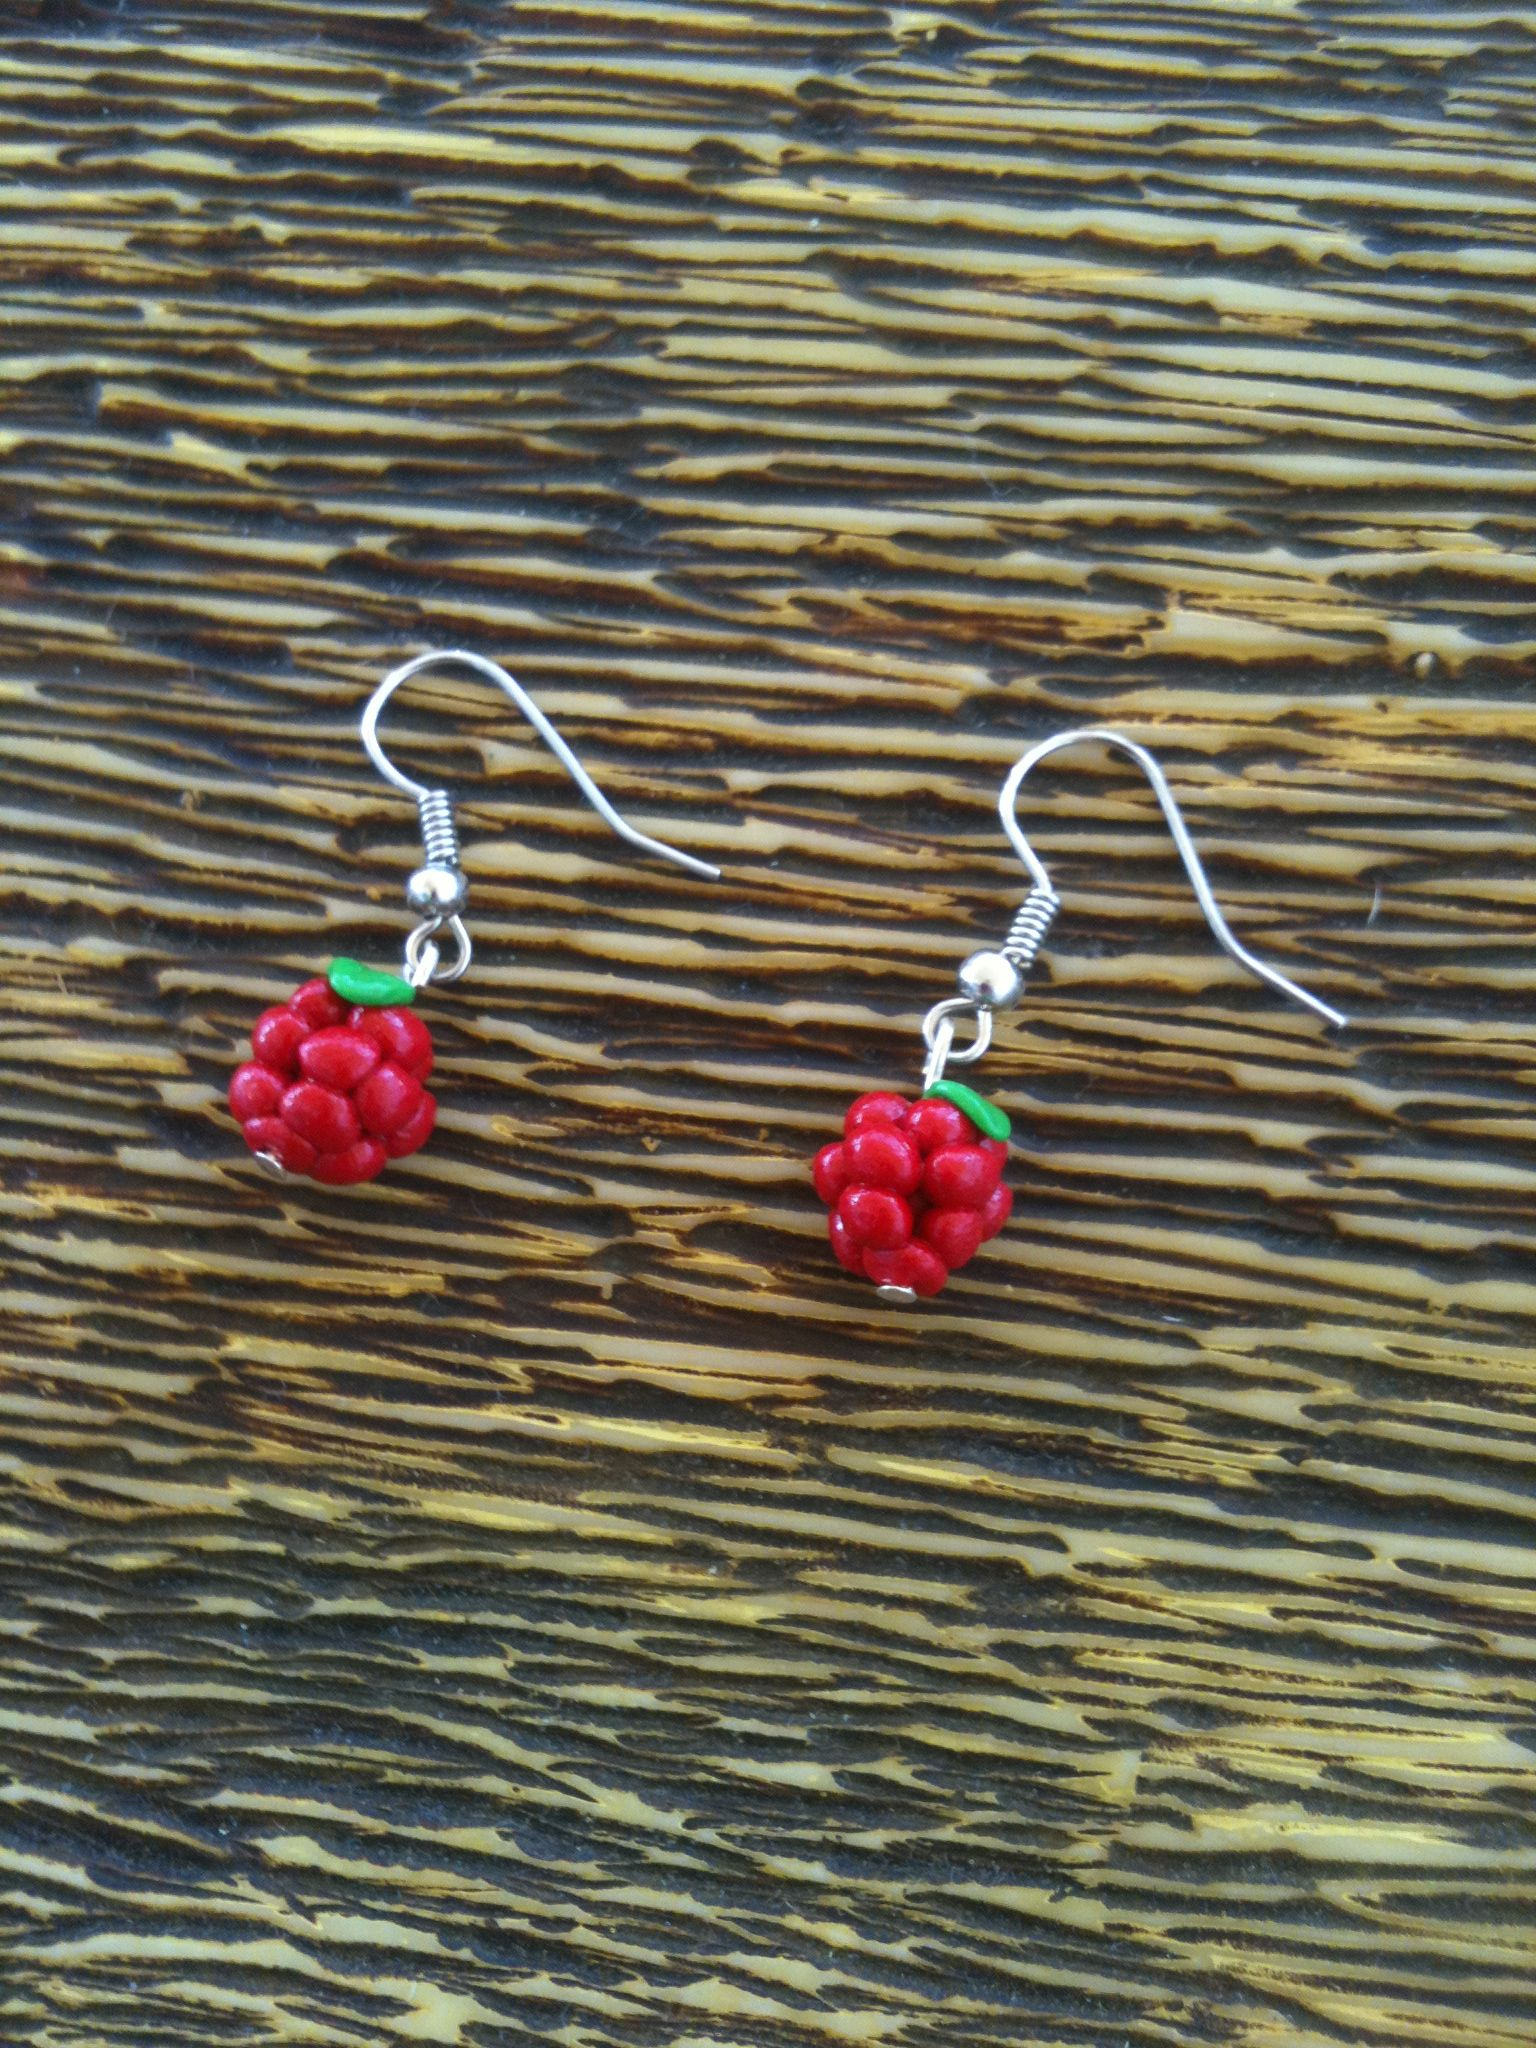 pendientes frambuesa fimo - berry earrings polymer clay fruit